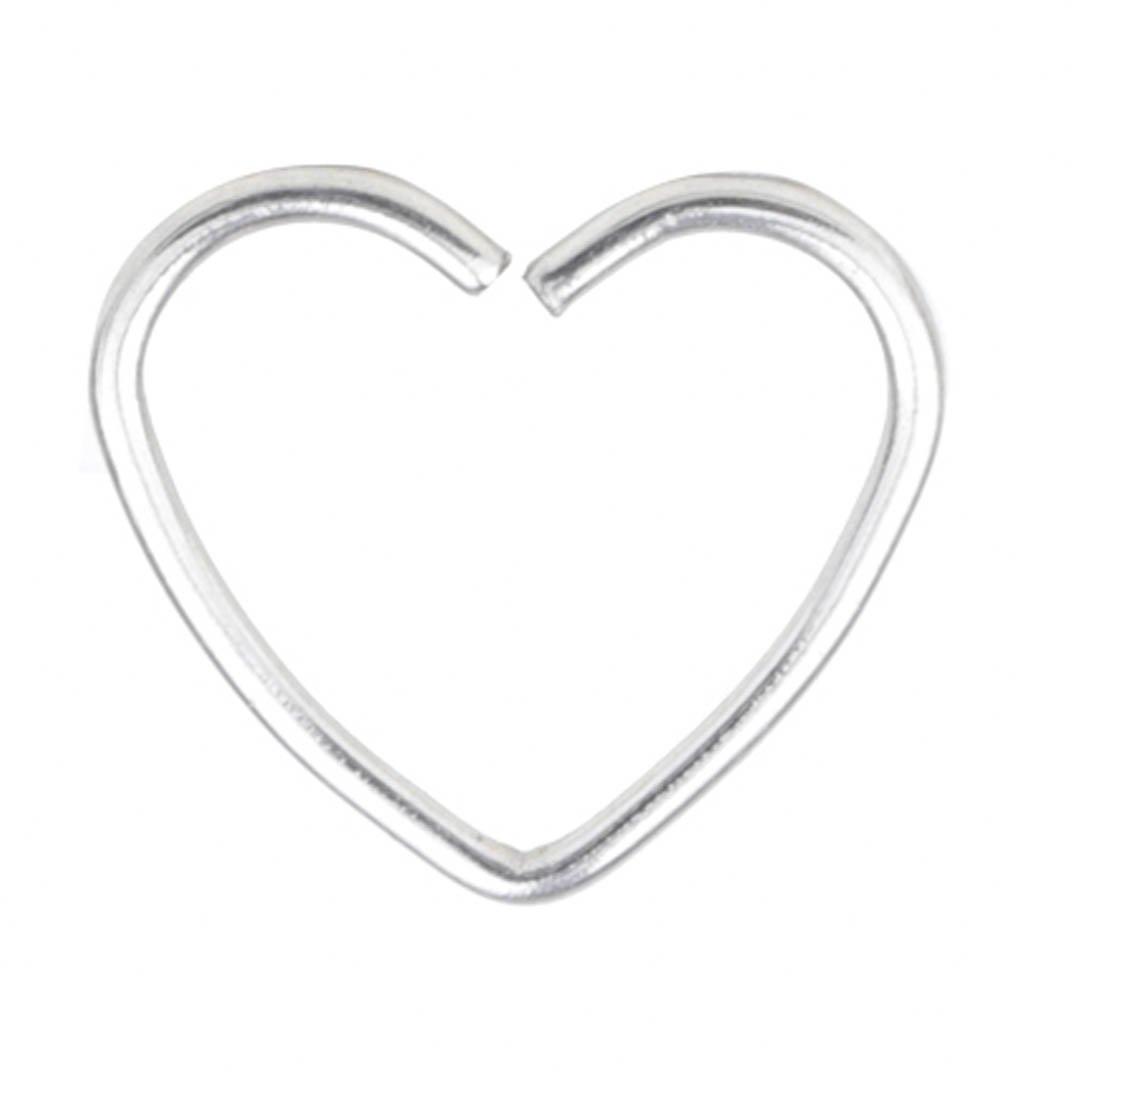 22G nose ring nose hoop Heart Shaped cartilage hoop earrings set cartilage earrings stud ear hoop